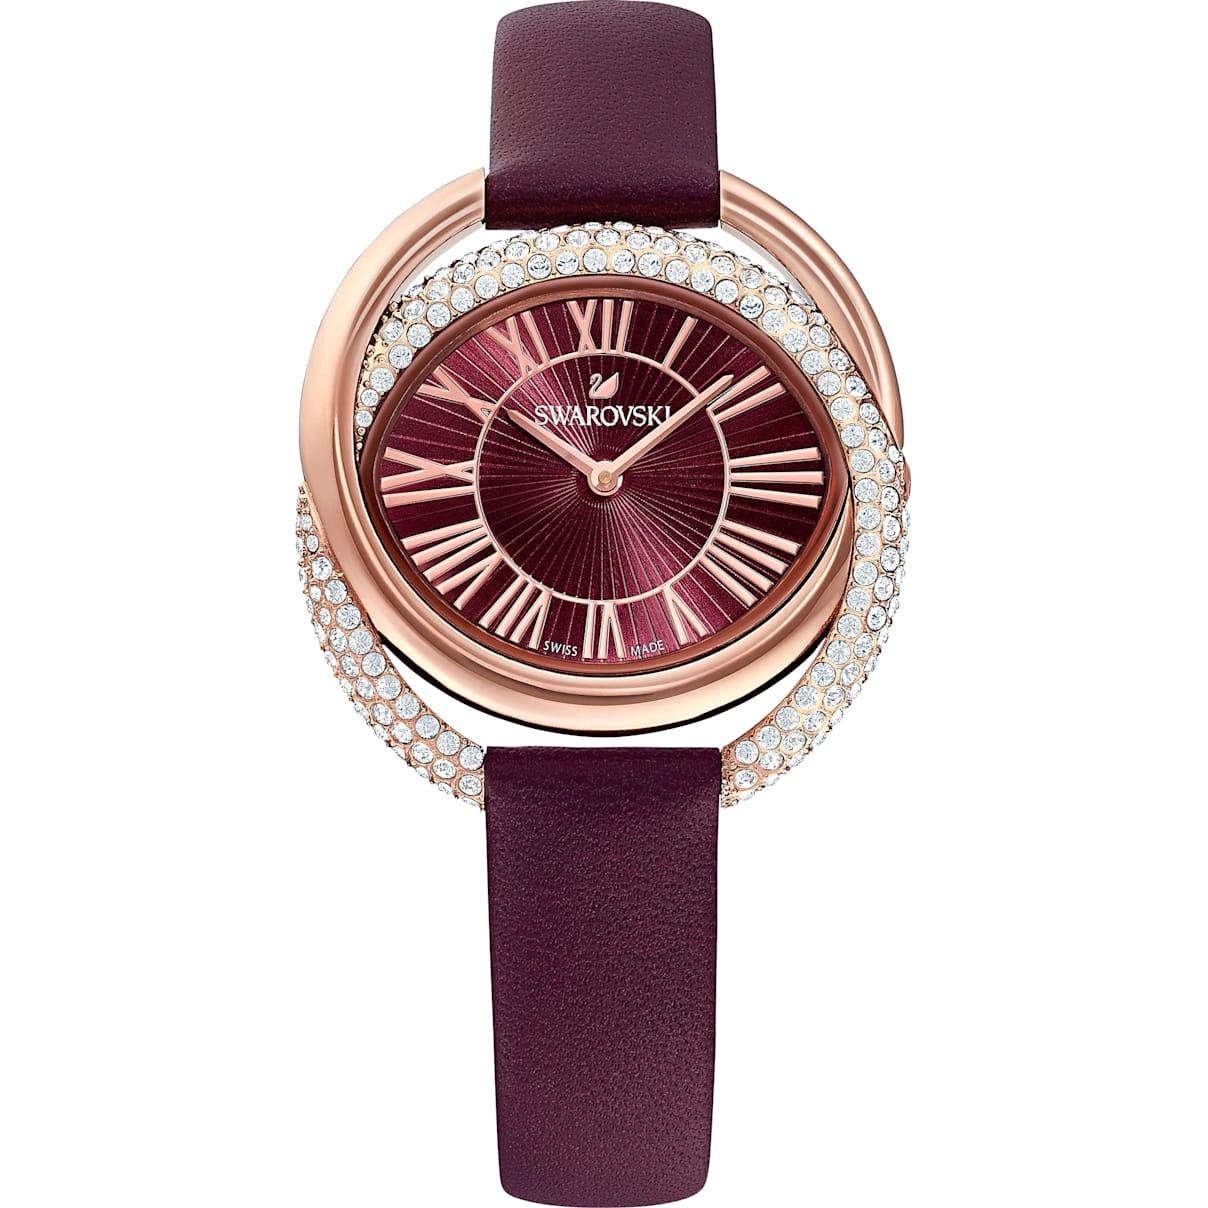 Swarovski Duo Watch, Leather Strap, Dark red, Rose-gold tone PVD